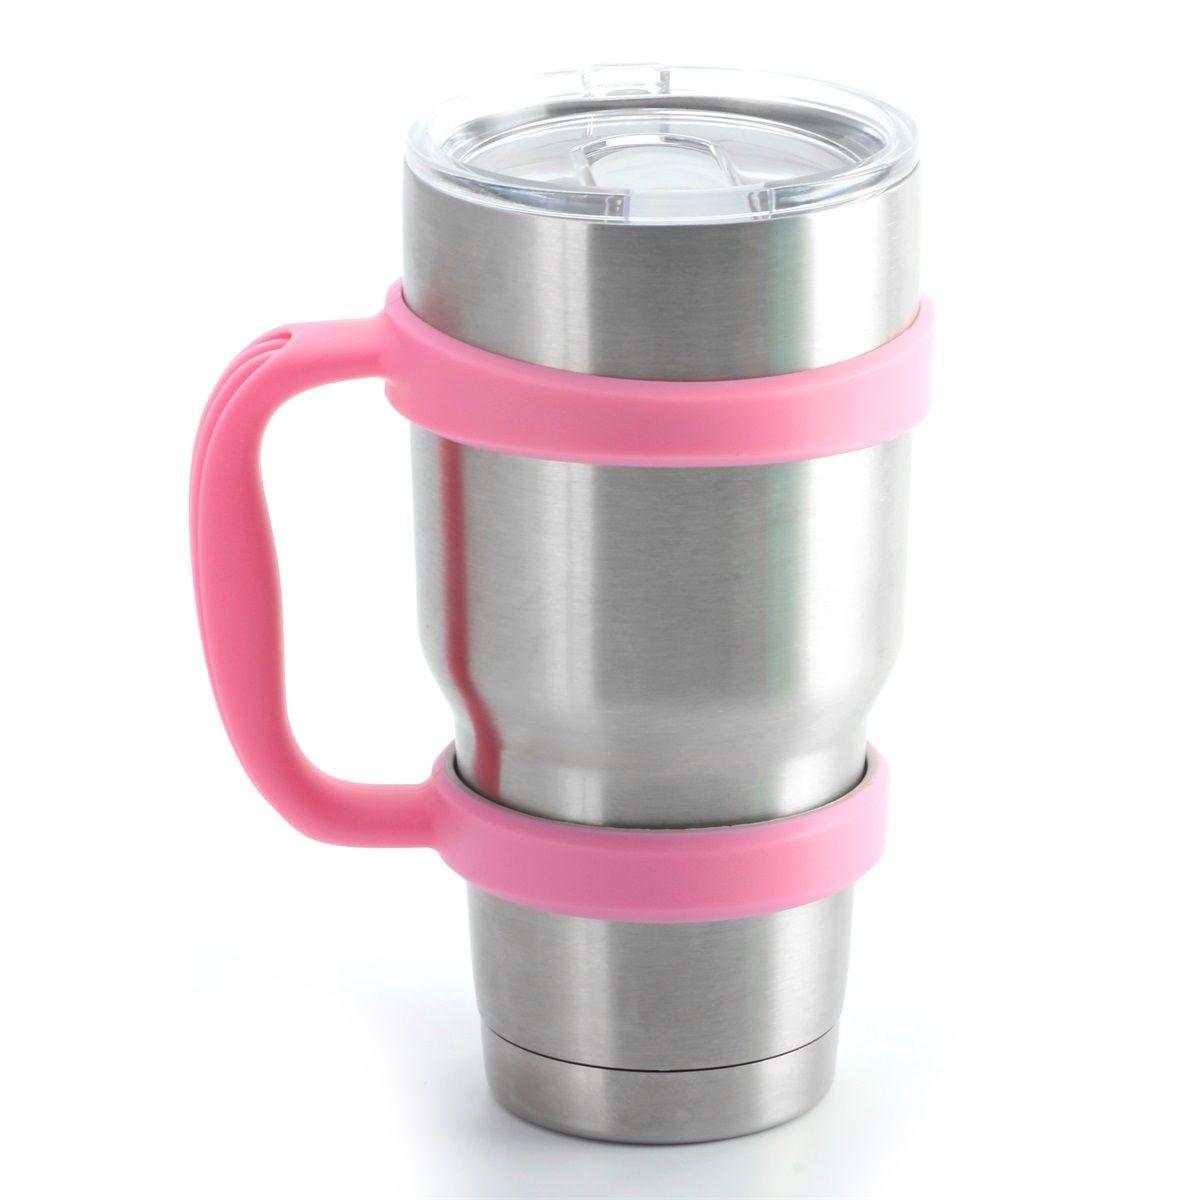 #1Pink Handle Yeti Rambler 30 oz Tumblers Rtic Mug Cup ...